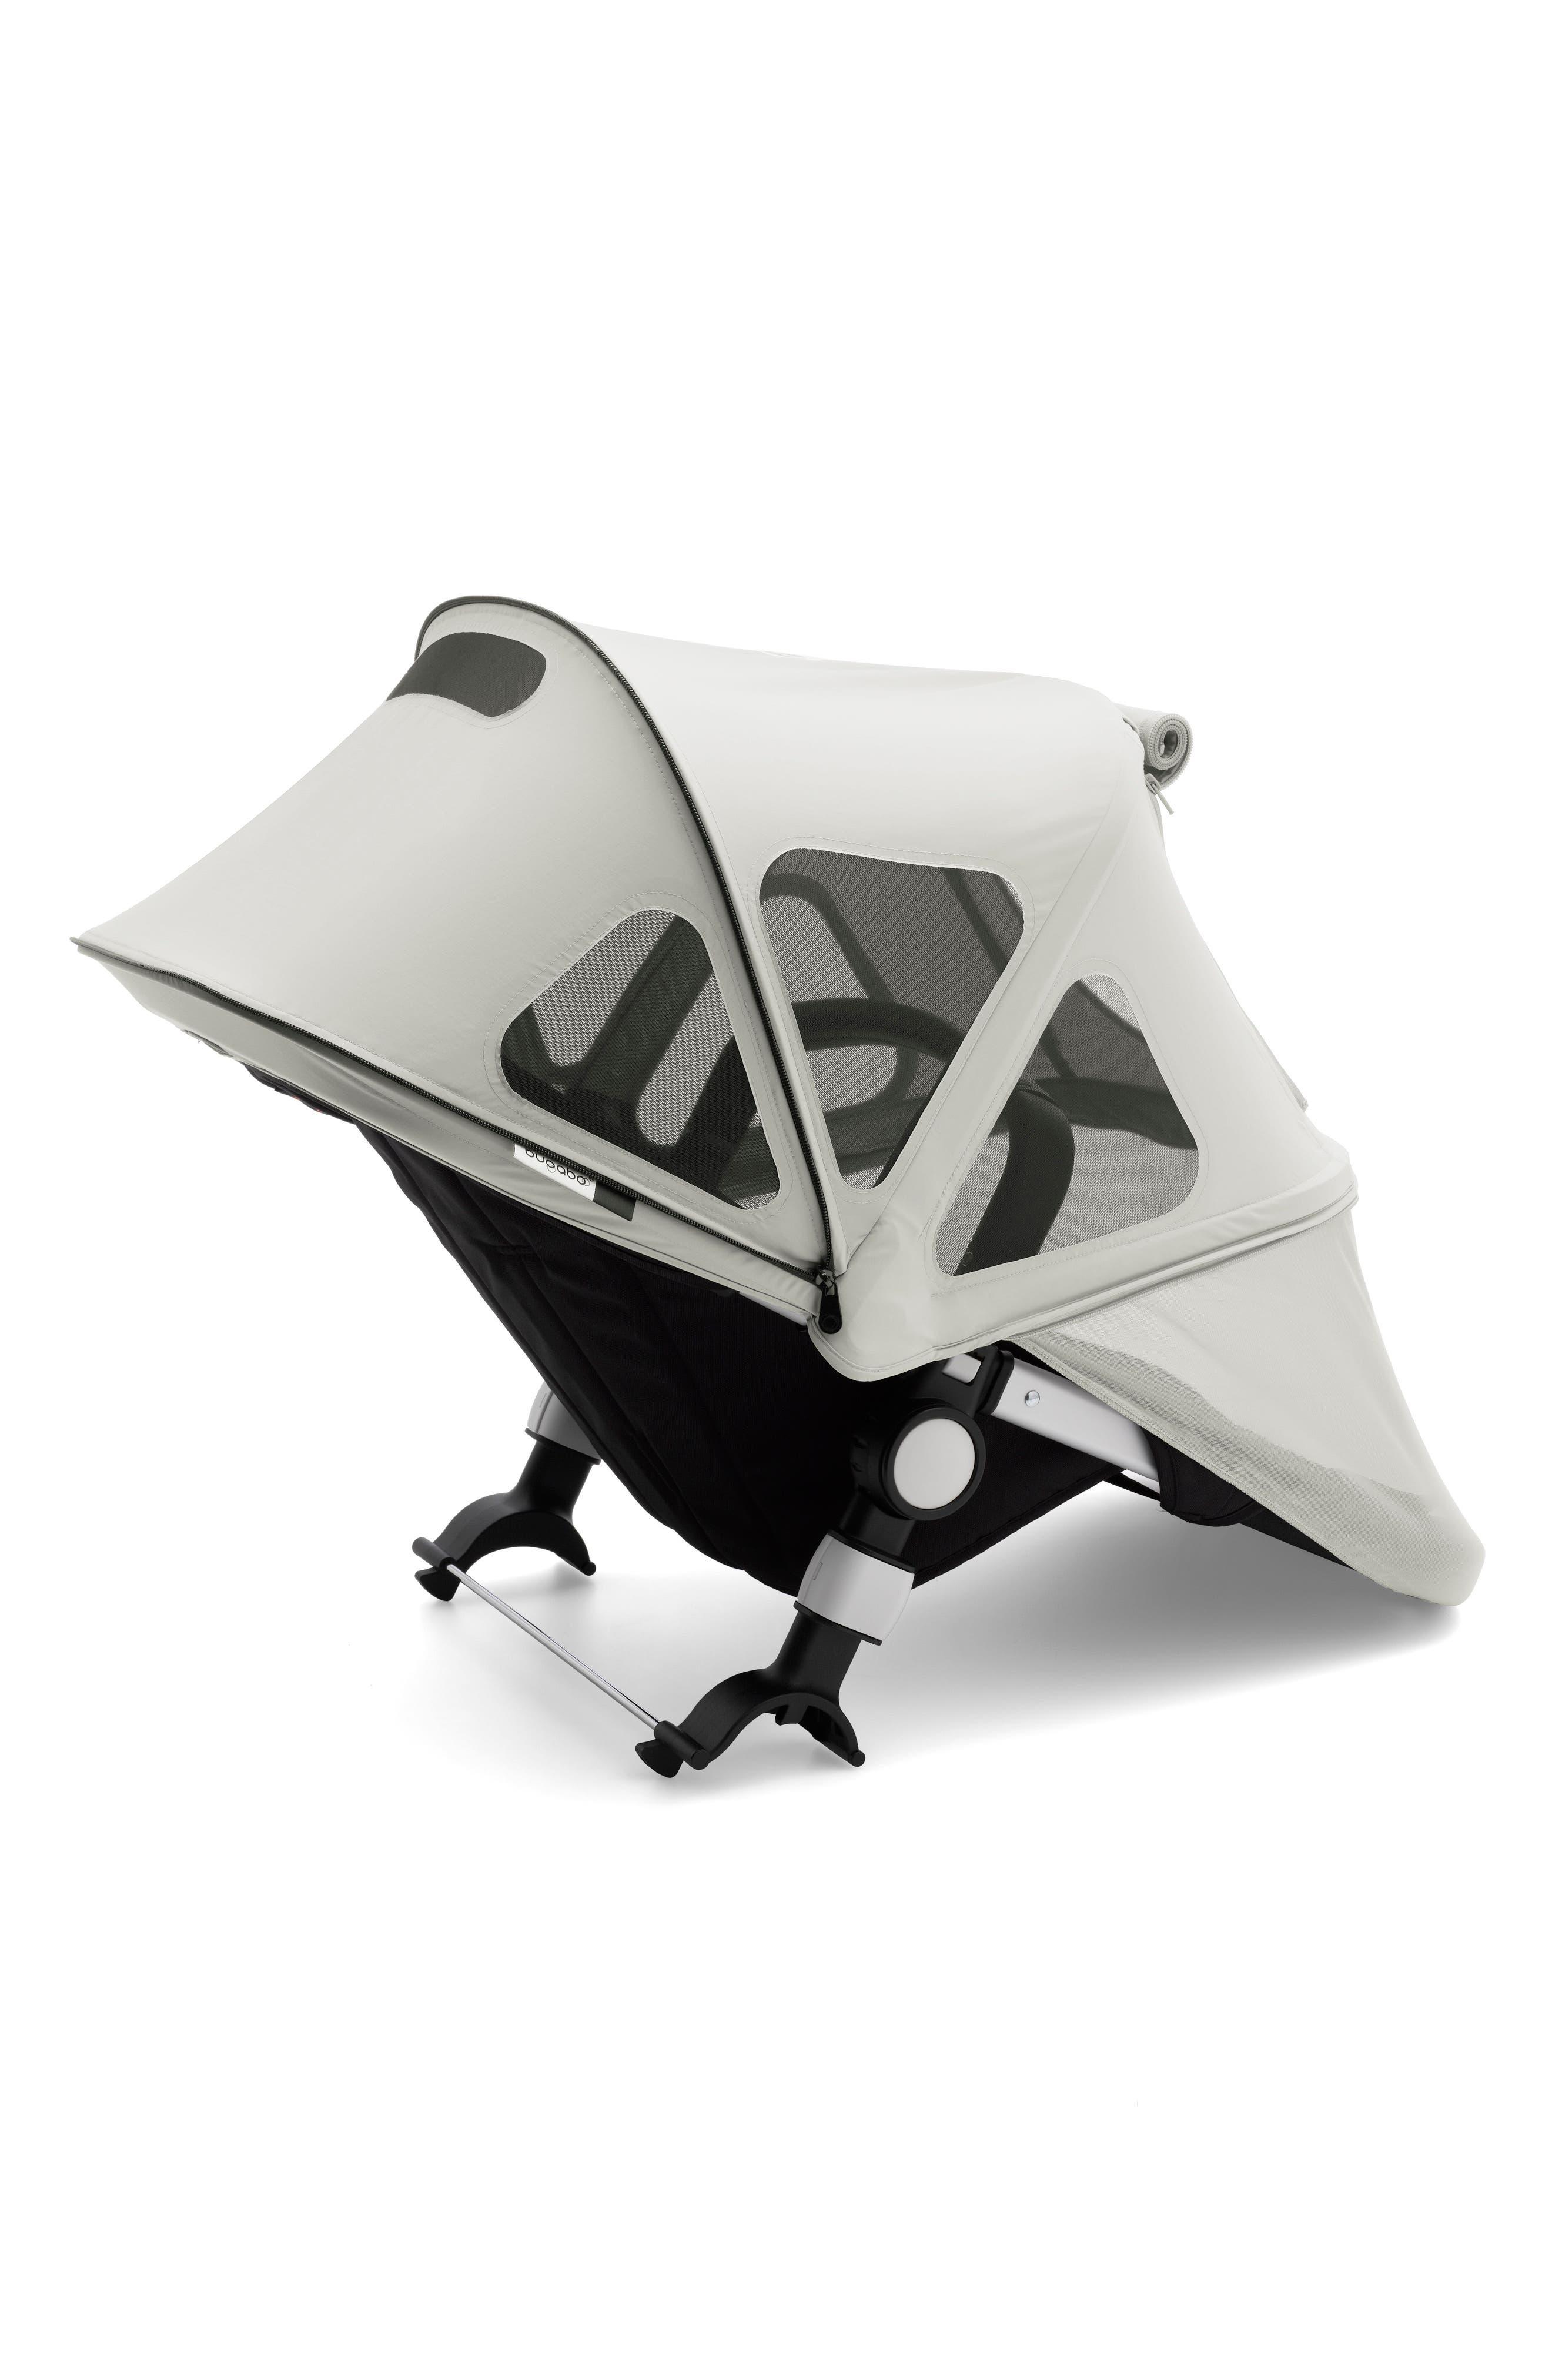 Breezy Sun Canopy for Fox & Cameleon³ Strollers,                             Alternate thumbnail 2, color,                             ARTIC GREY